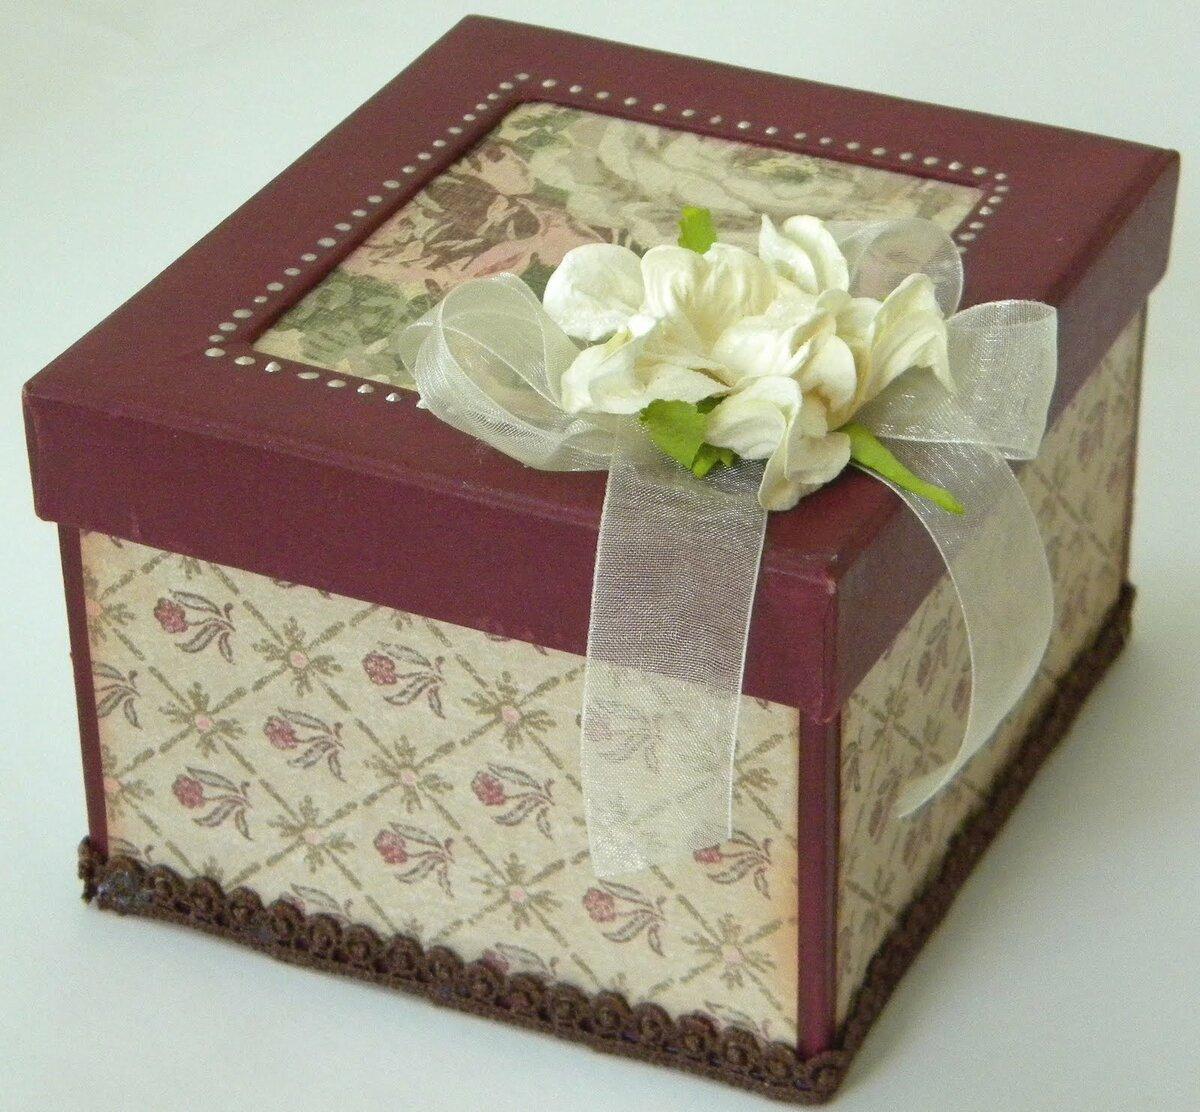 символики украшение коробок картинки ангора сургуте